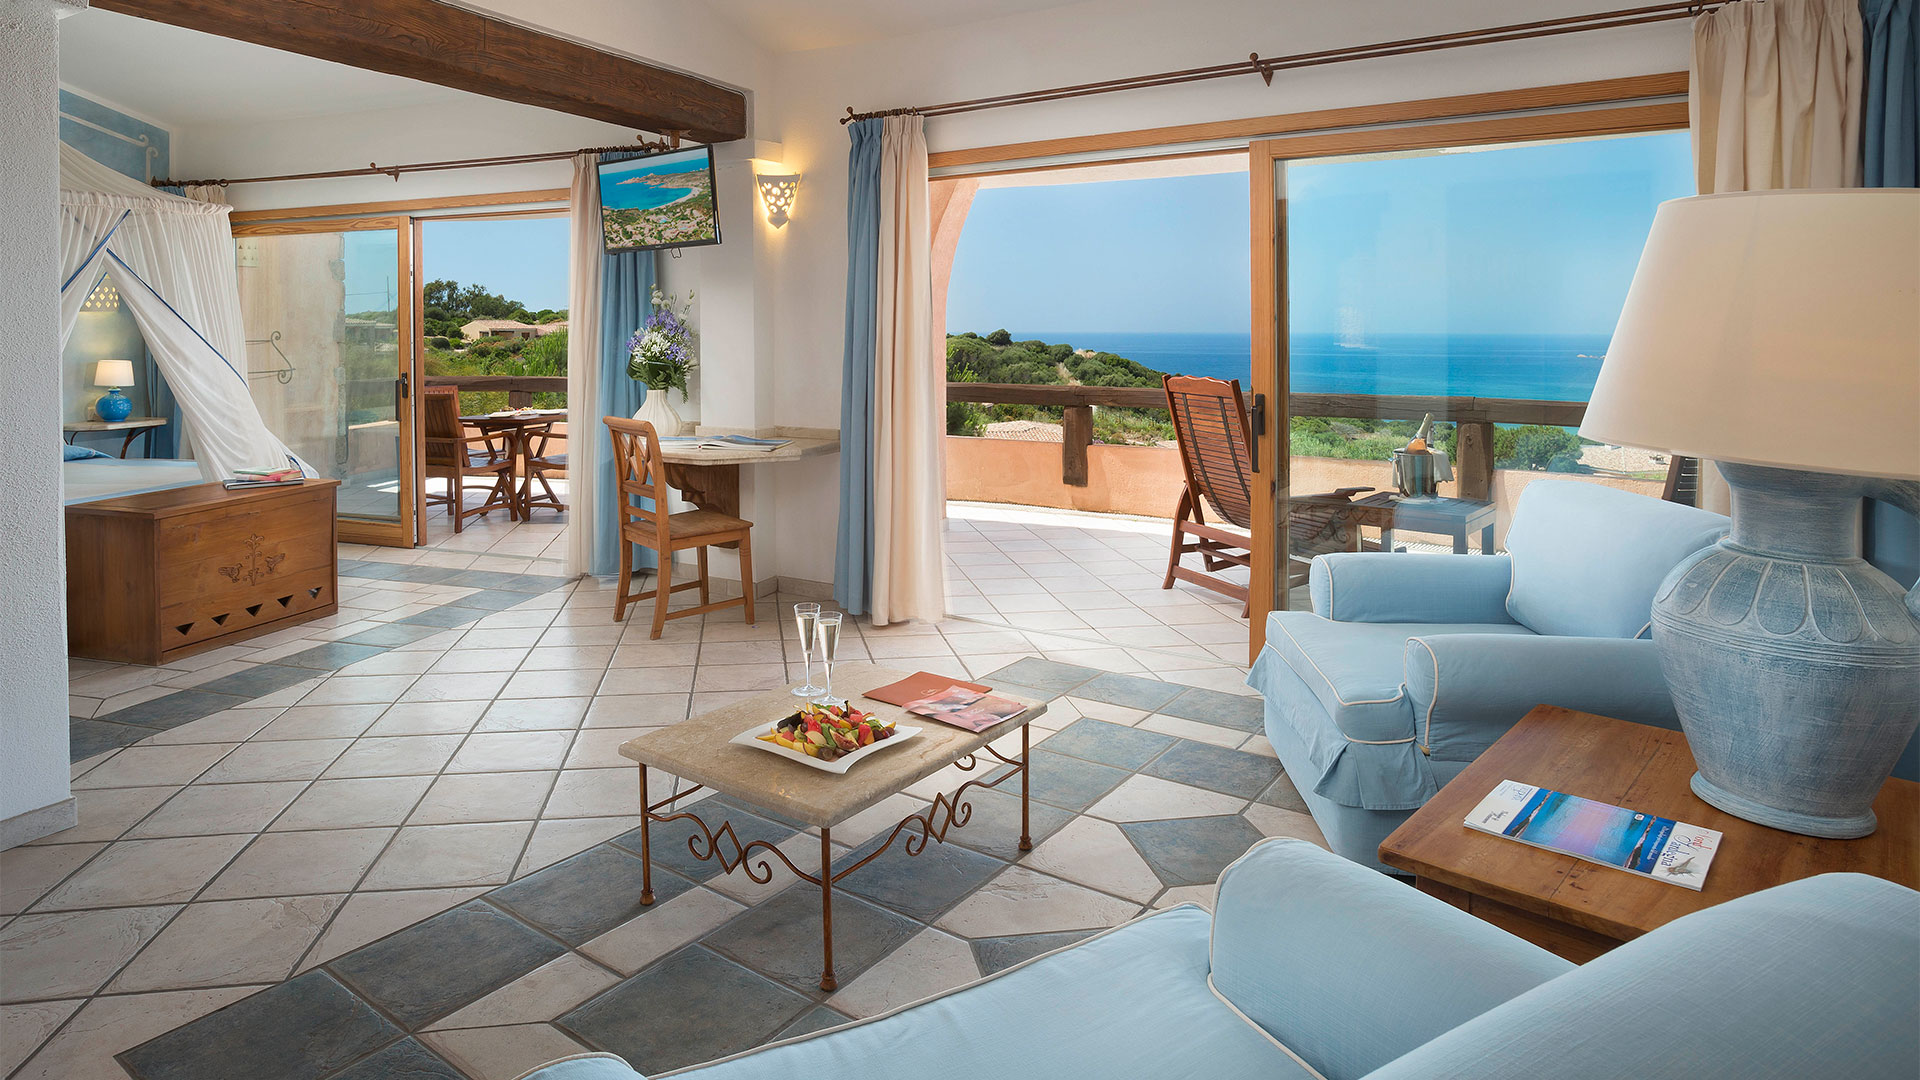 hotel-marinedda-slider-camere-suite-president-mare-sardegna-1